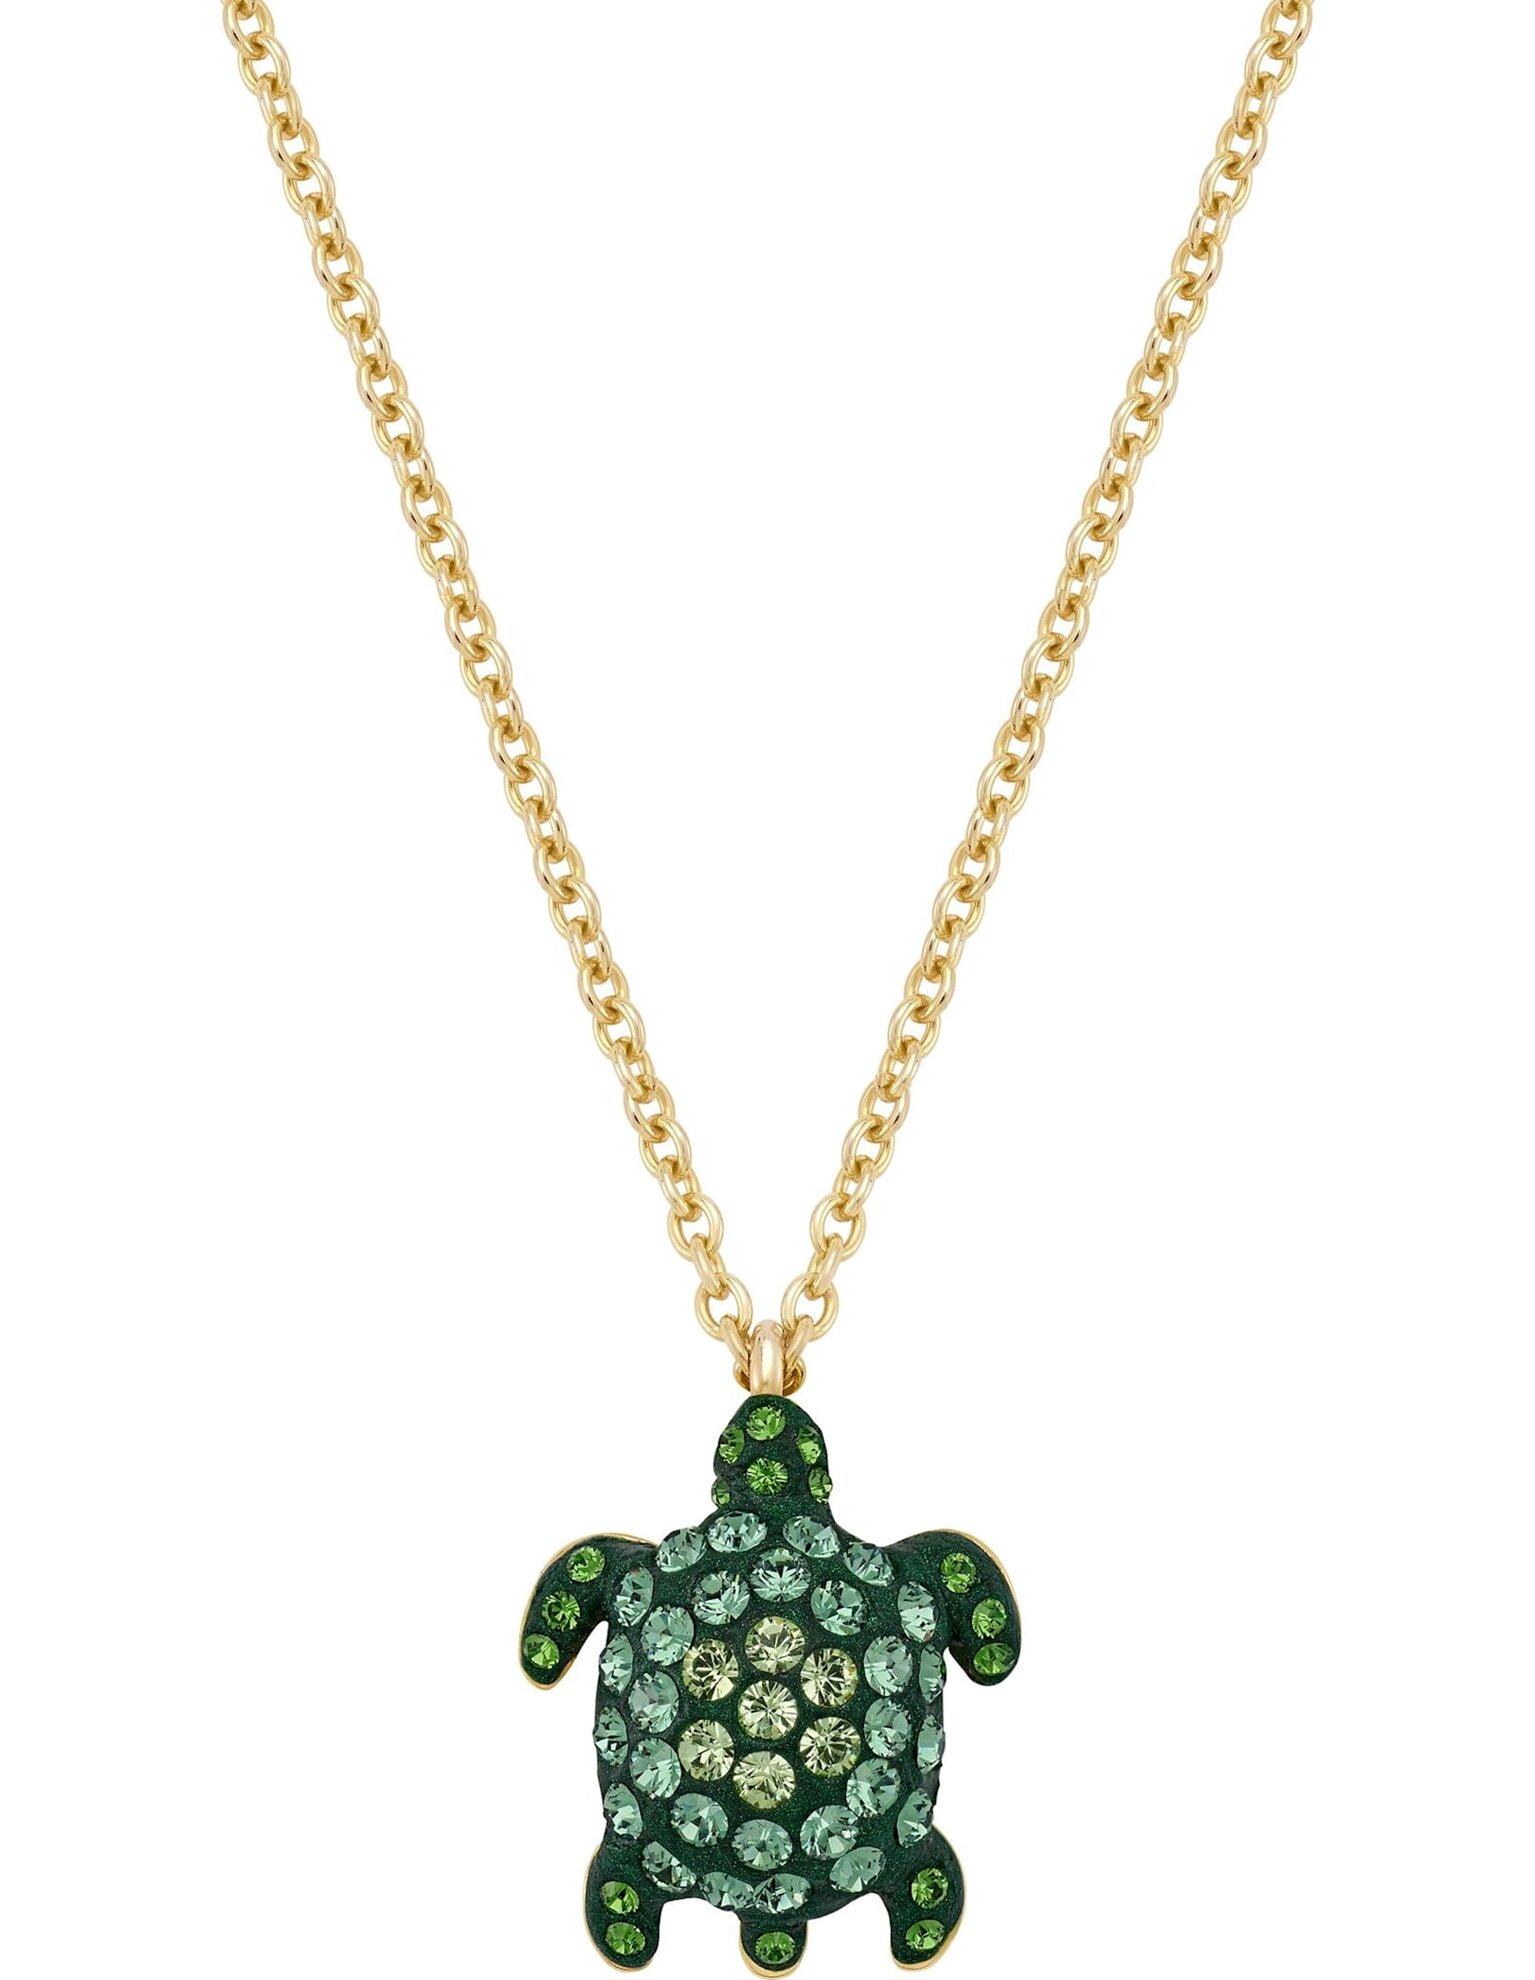 Picture of Mustique Sea Life Turtle kolye, Büyük, Yeşil, Altın rengi kaplama